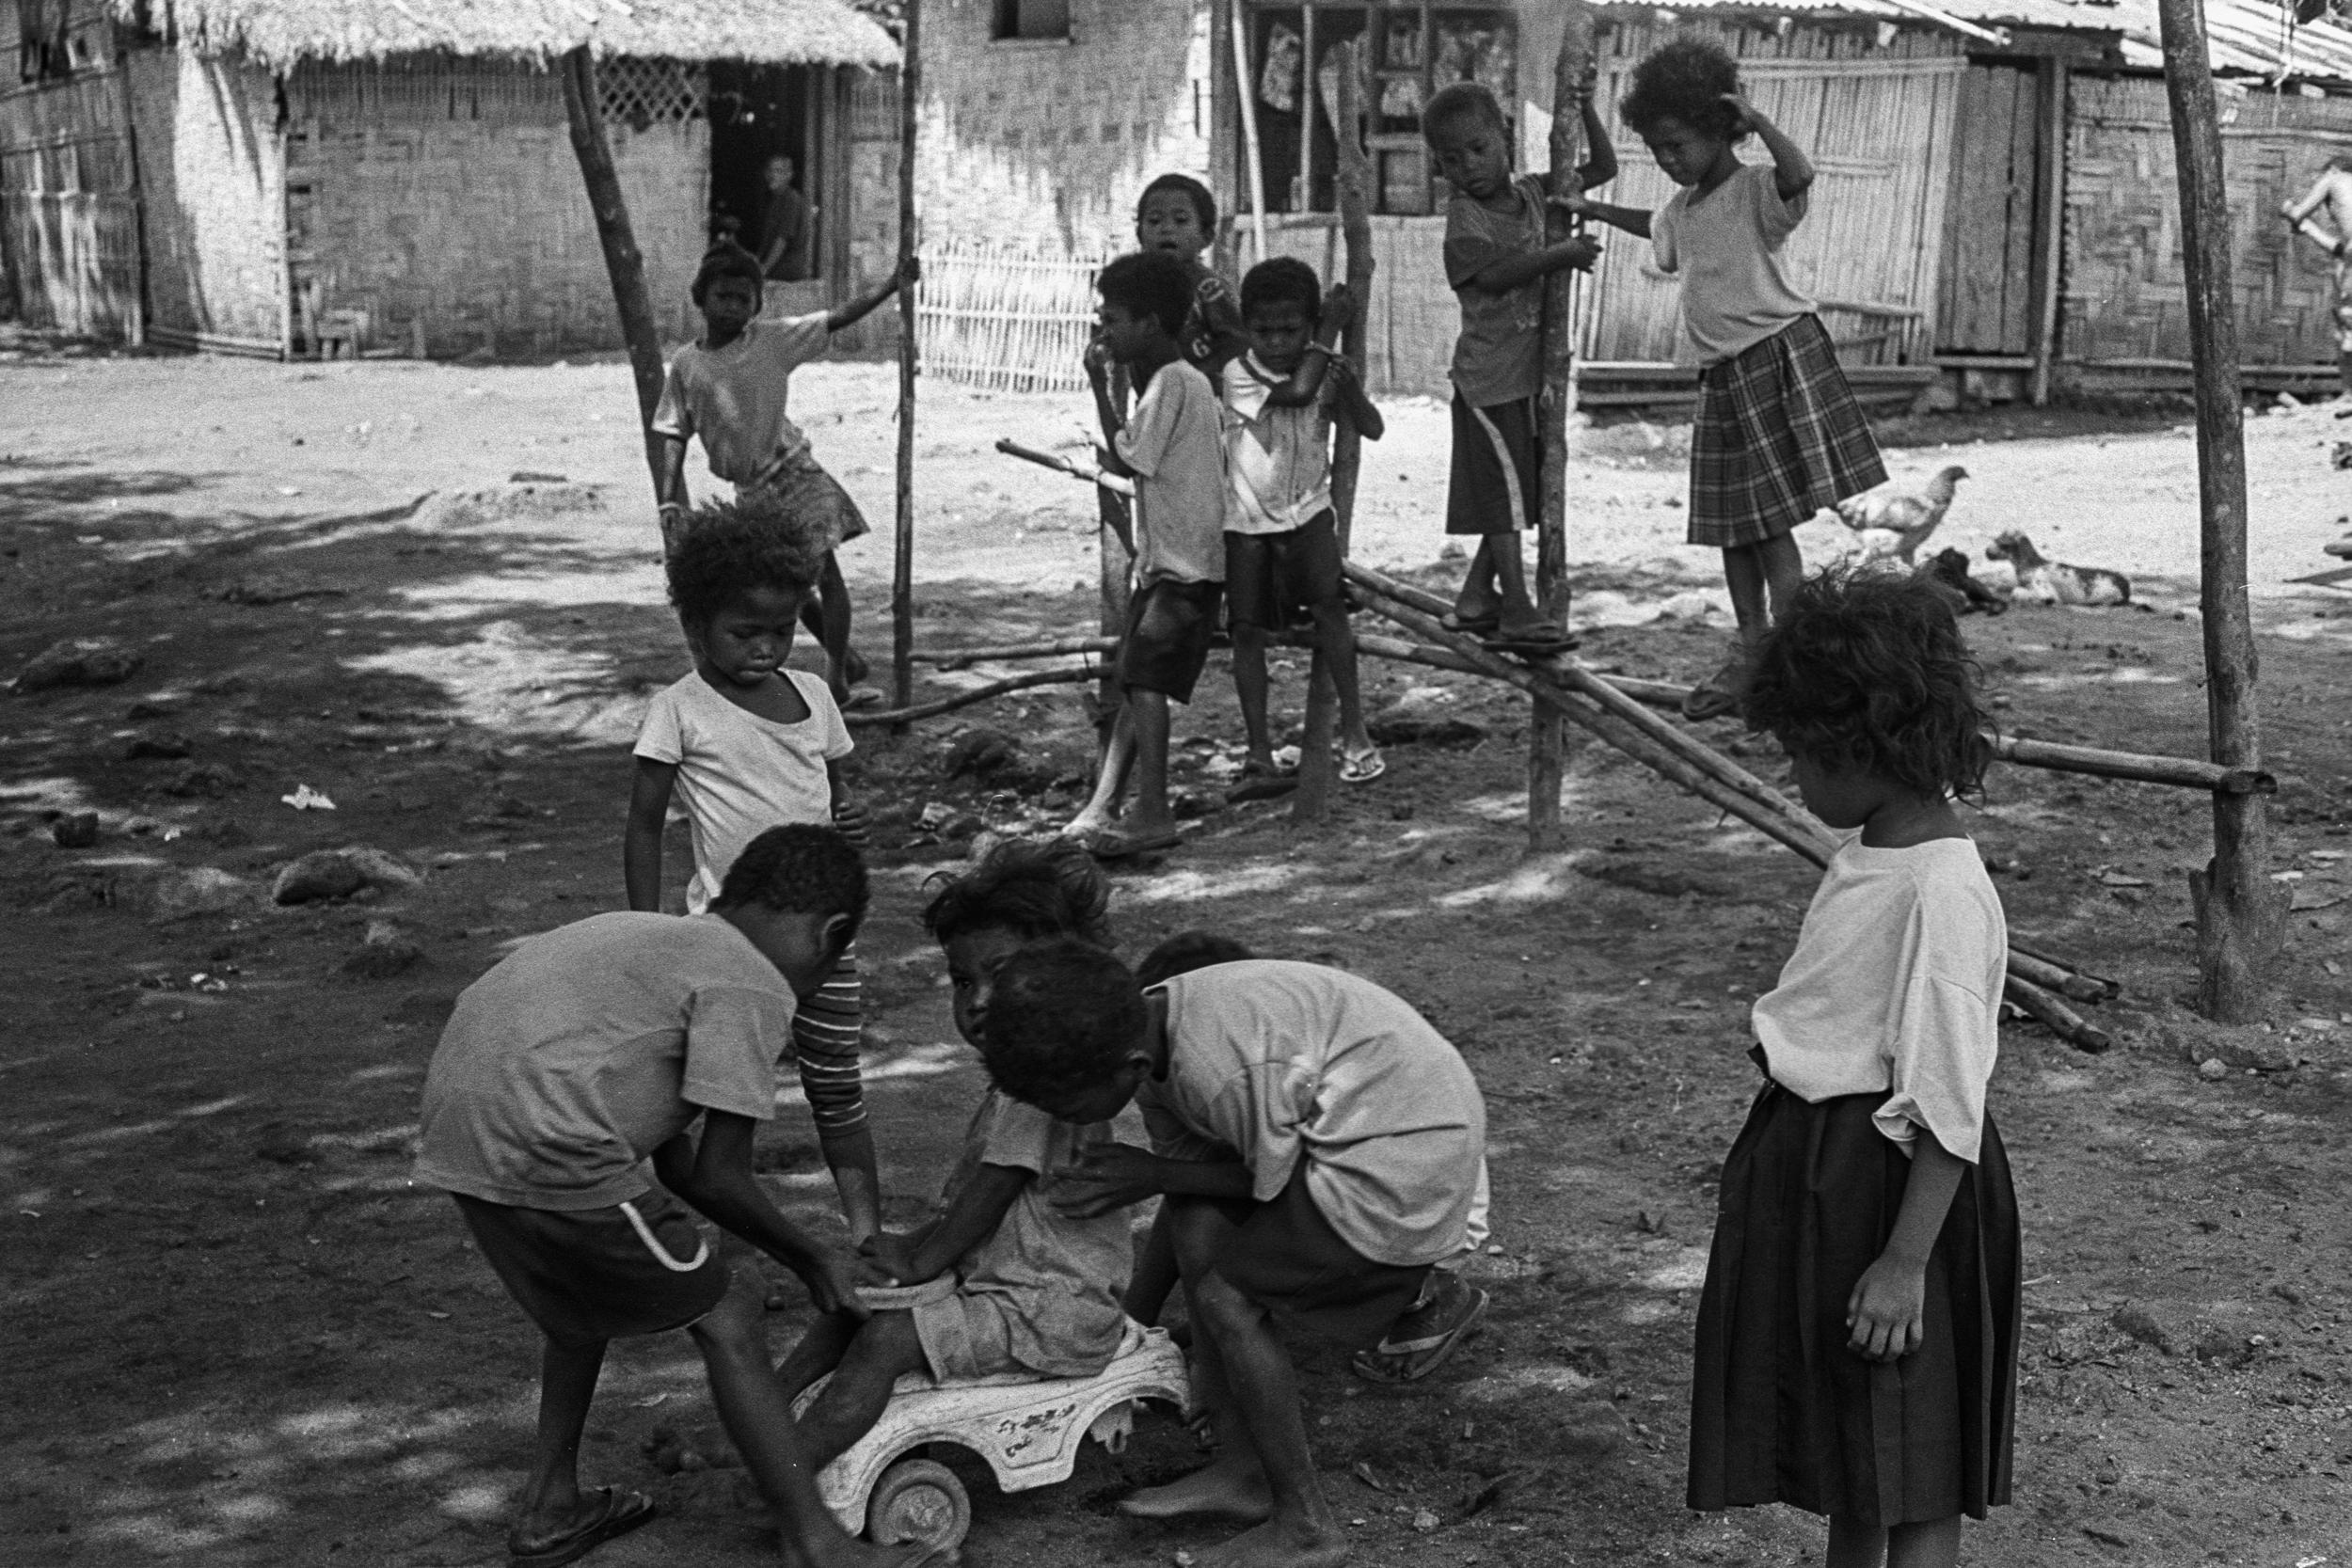 Aeta Children playing in their village near Mount Pinatubo, Philippines, 2018.